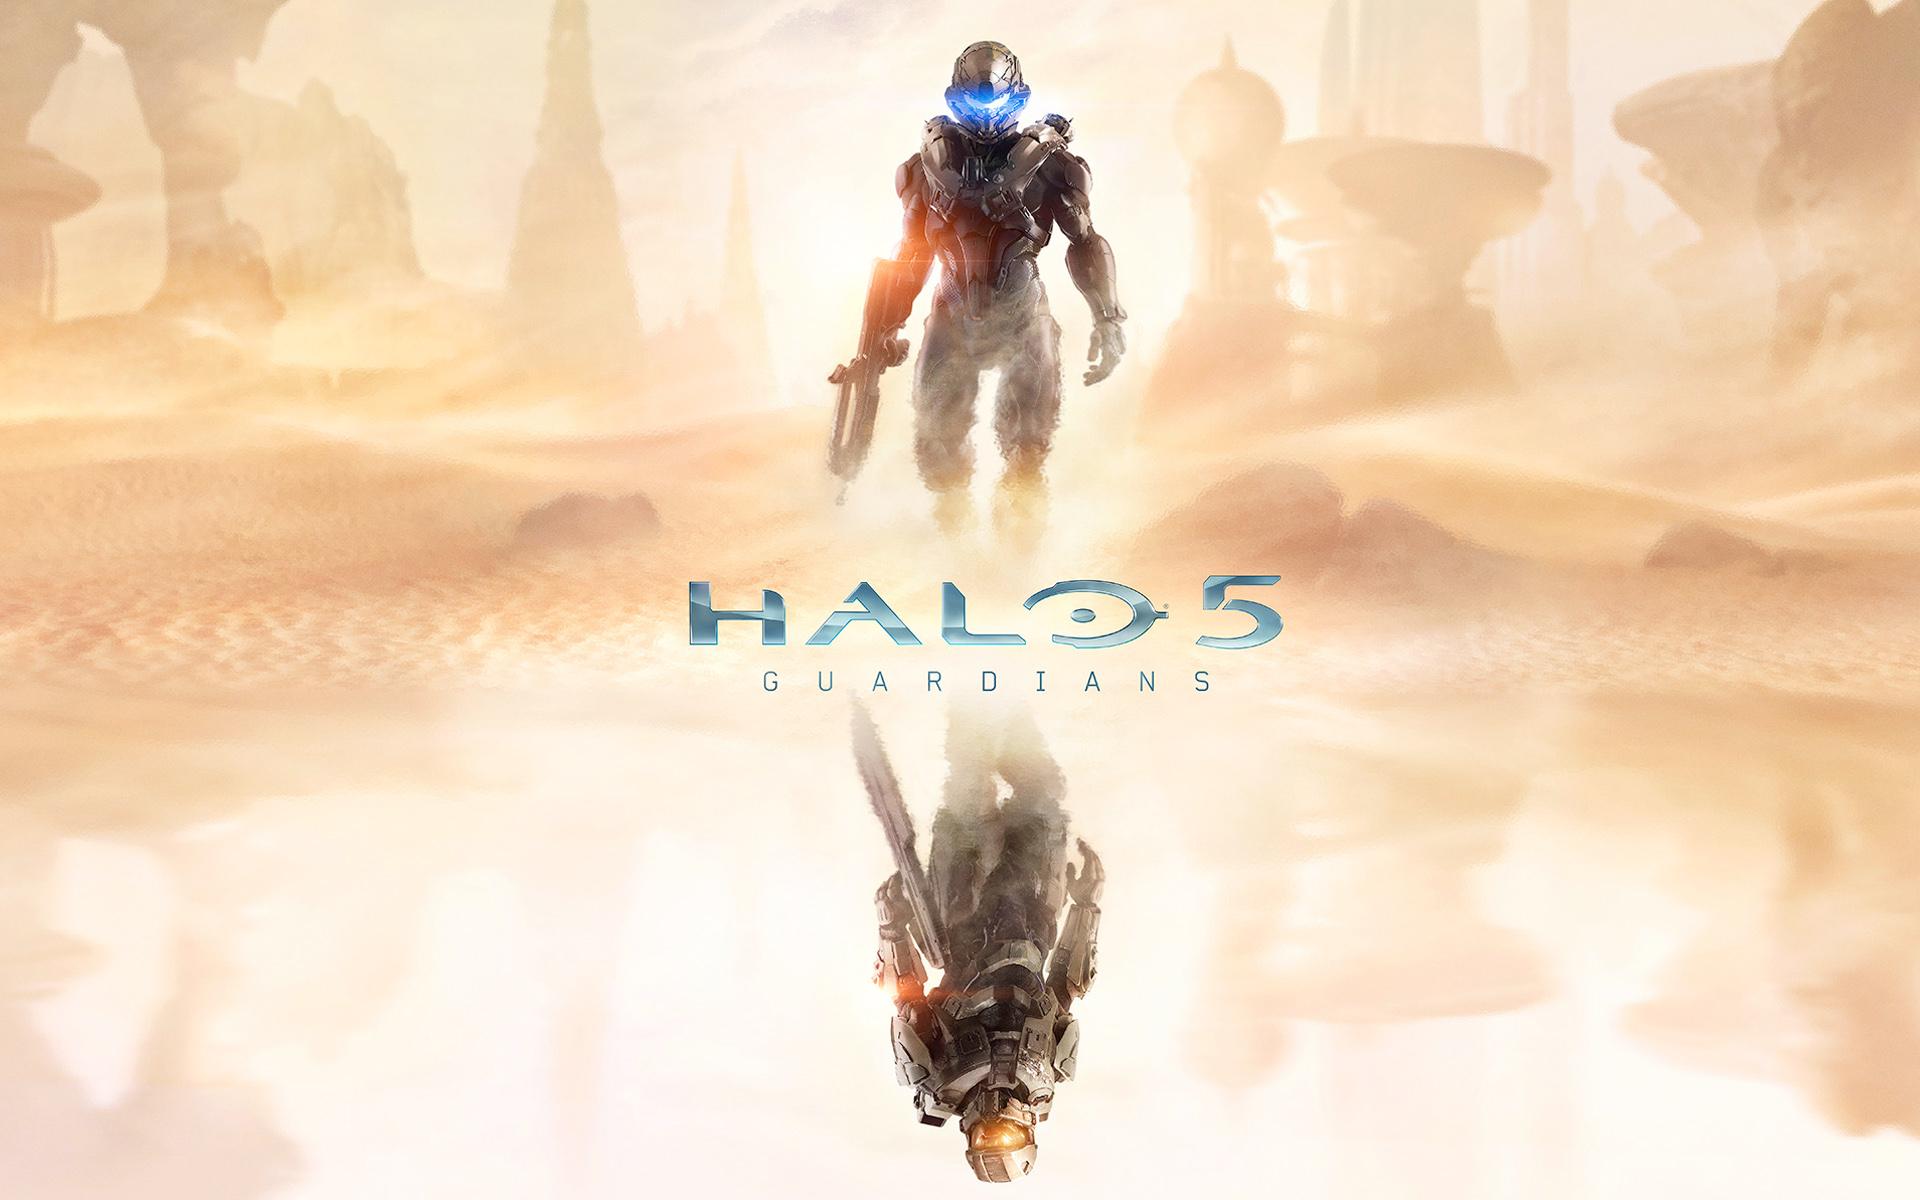 2015 halo 5 guardians game wallpaper 44797